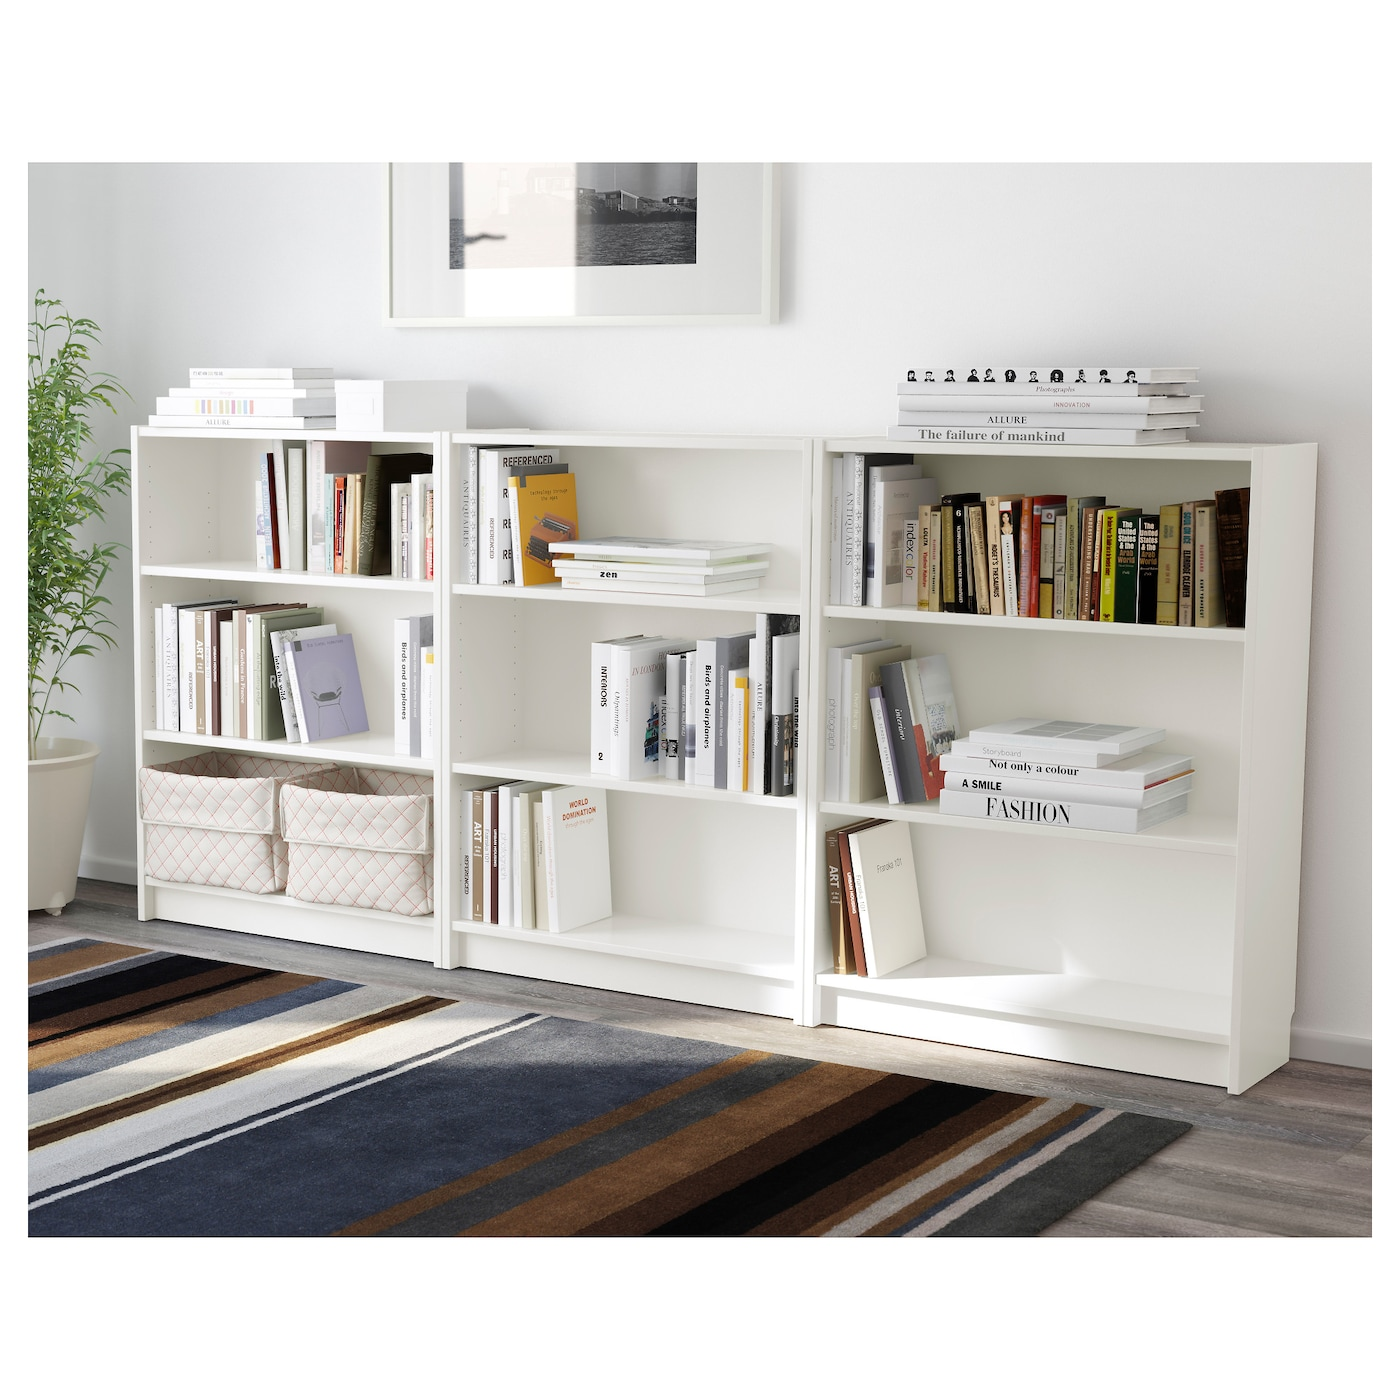 BILLY Bookcase   white 200 200/20x200200x20200 20/20